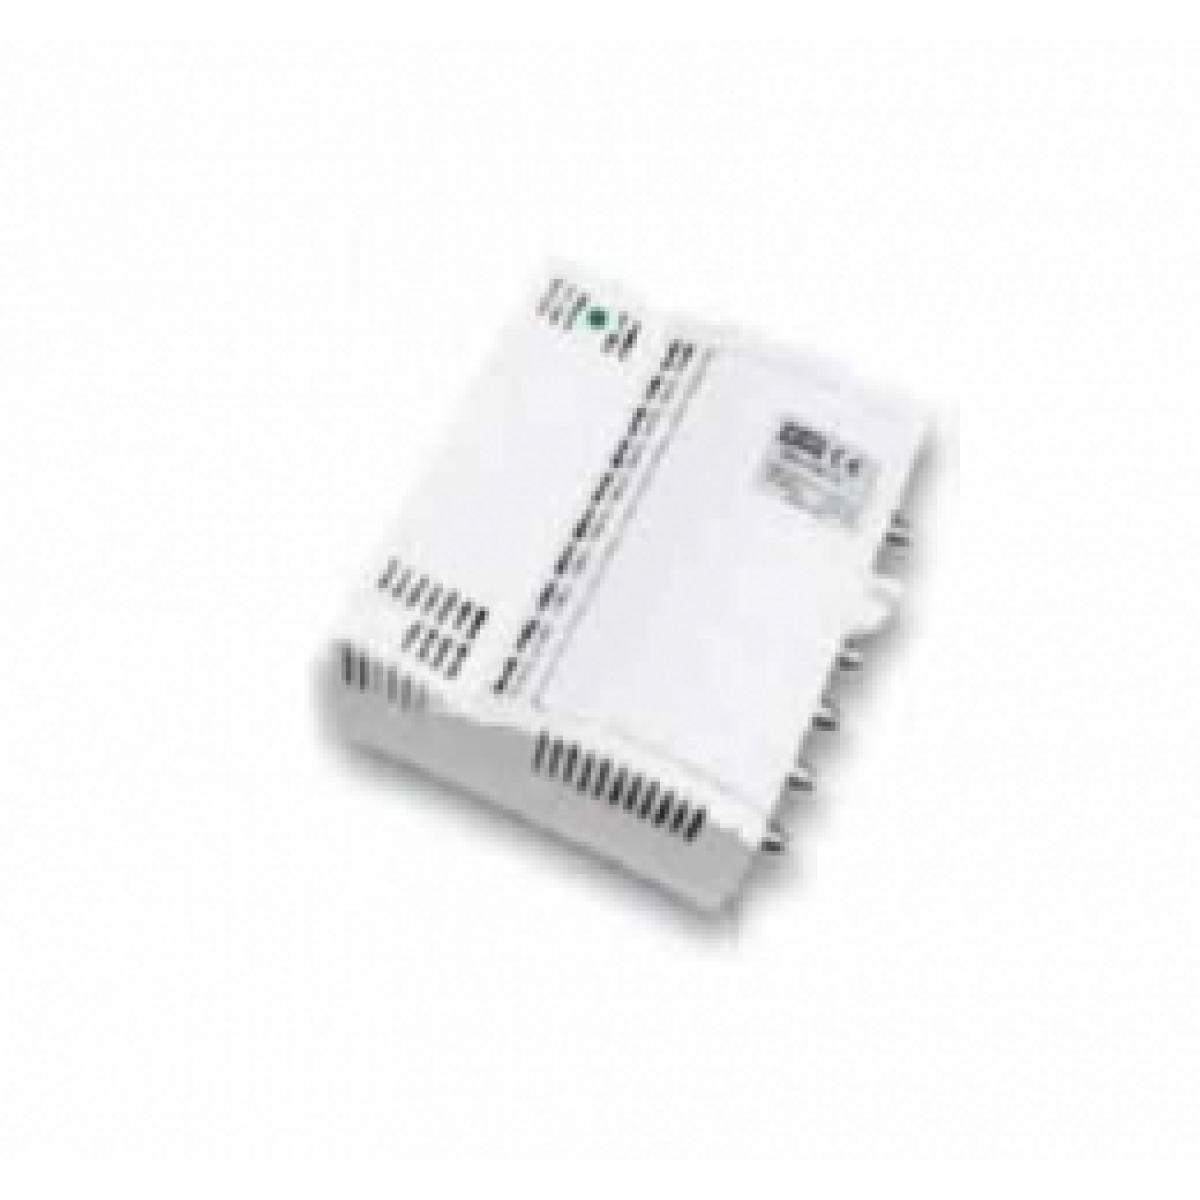 Centralino mbj2640lte 4 in 30db/35-36 lt 223412 fracarro